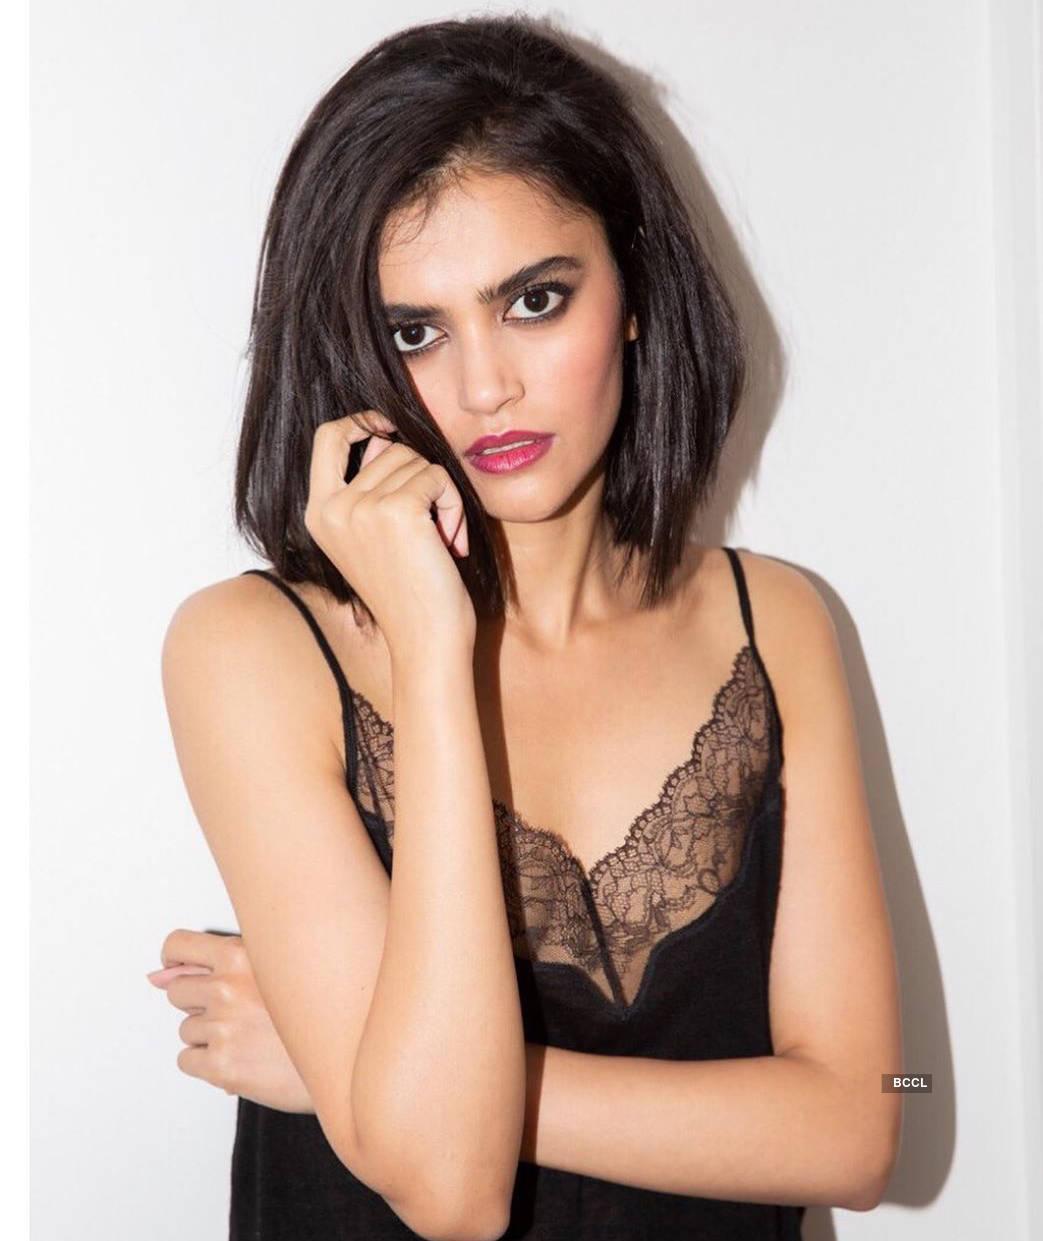 Meet globetrotter Natasha Ramachandran